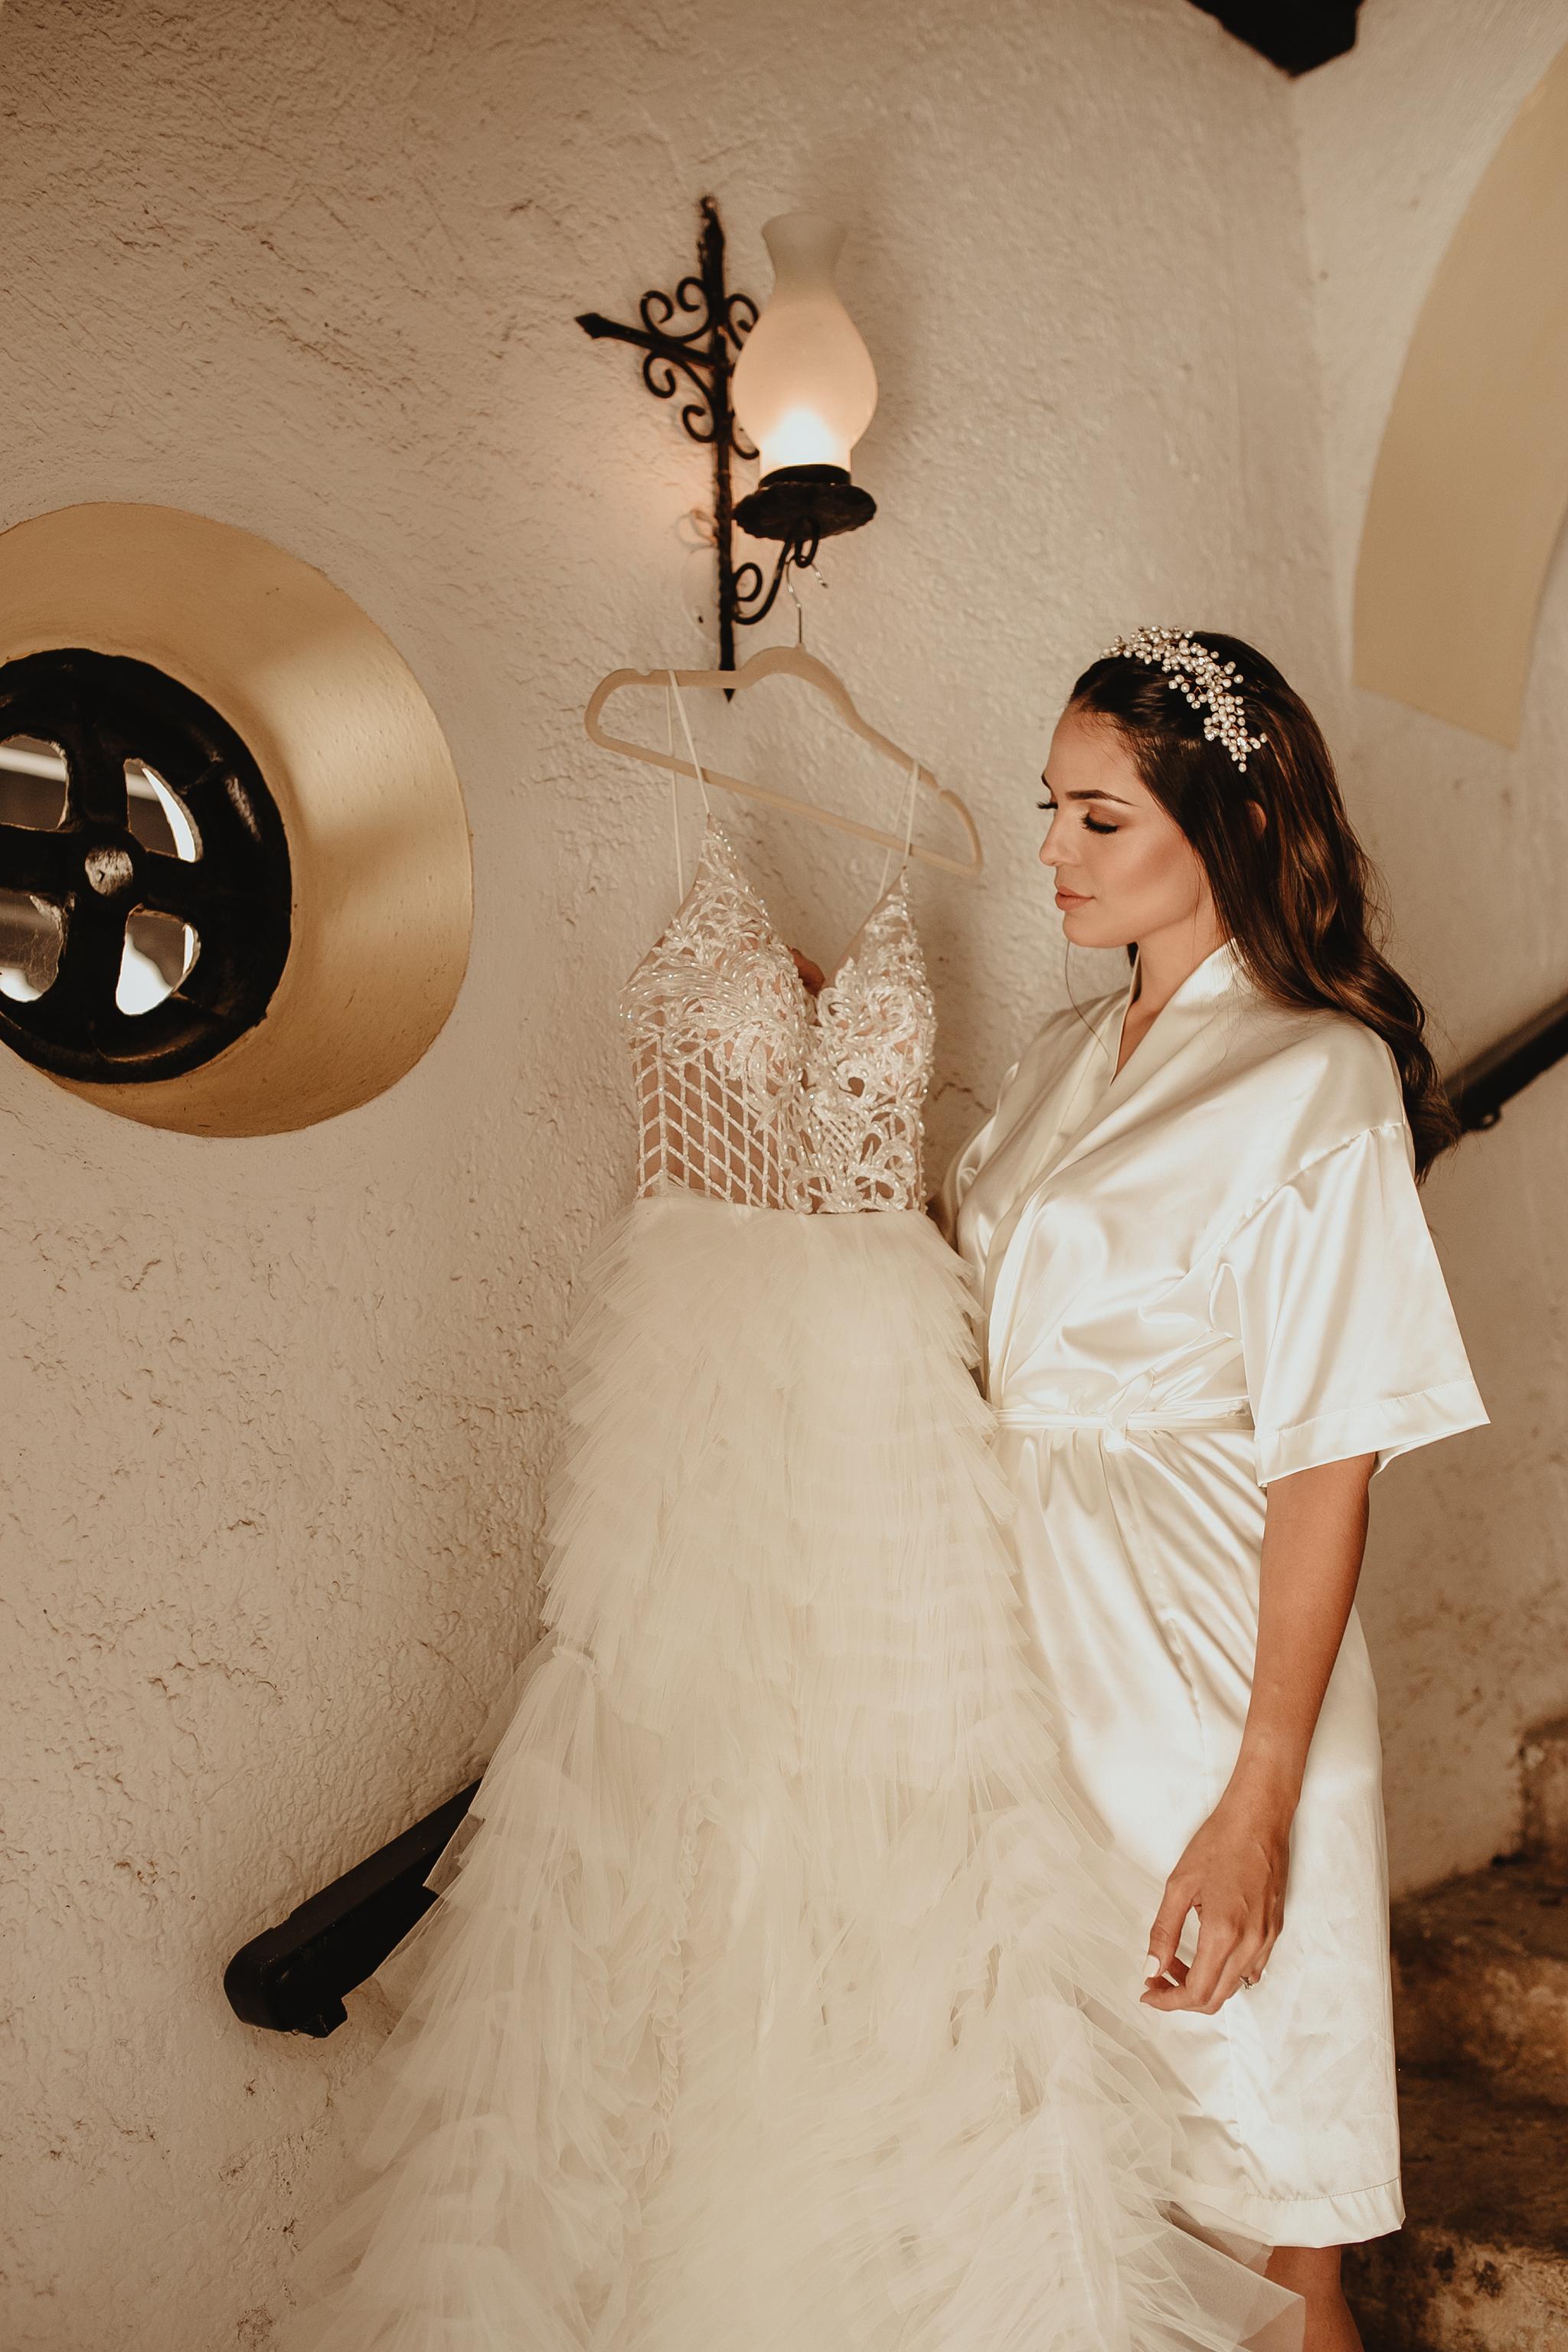 0053R&F__WeddingDestination_Weddingmerida_BodaMexico_FotografoDeBodas_FabrizioSimoneenFotografo.jpg